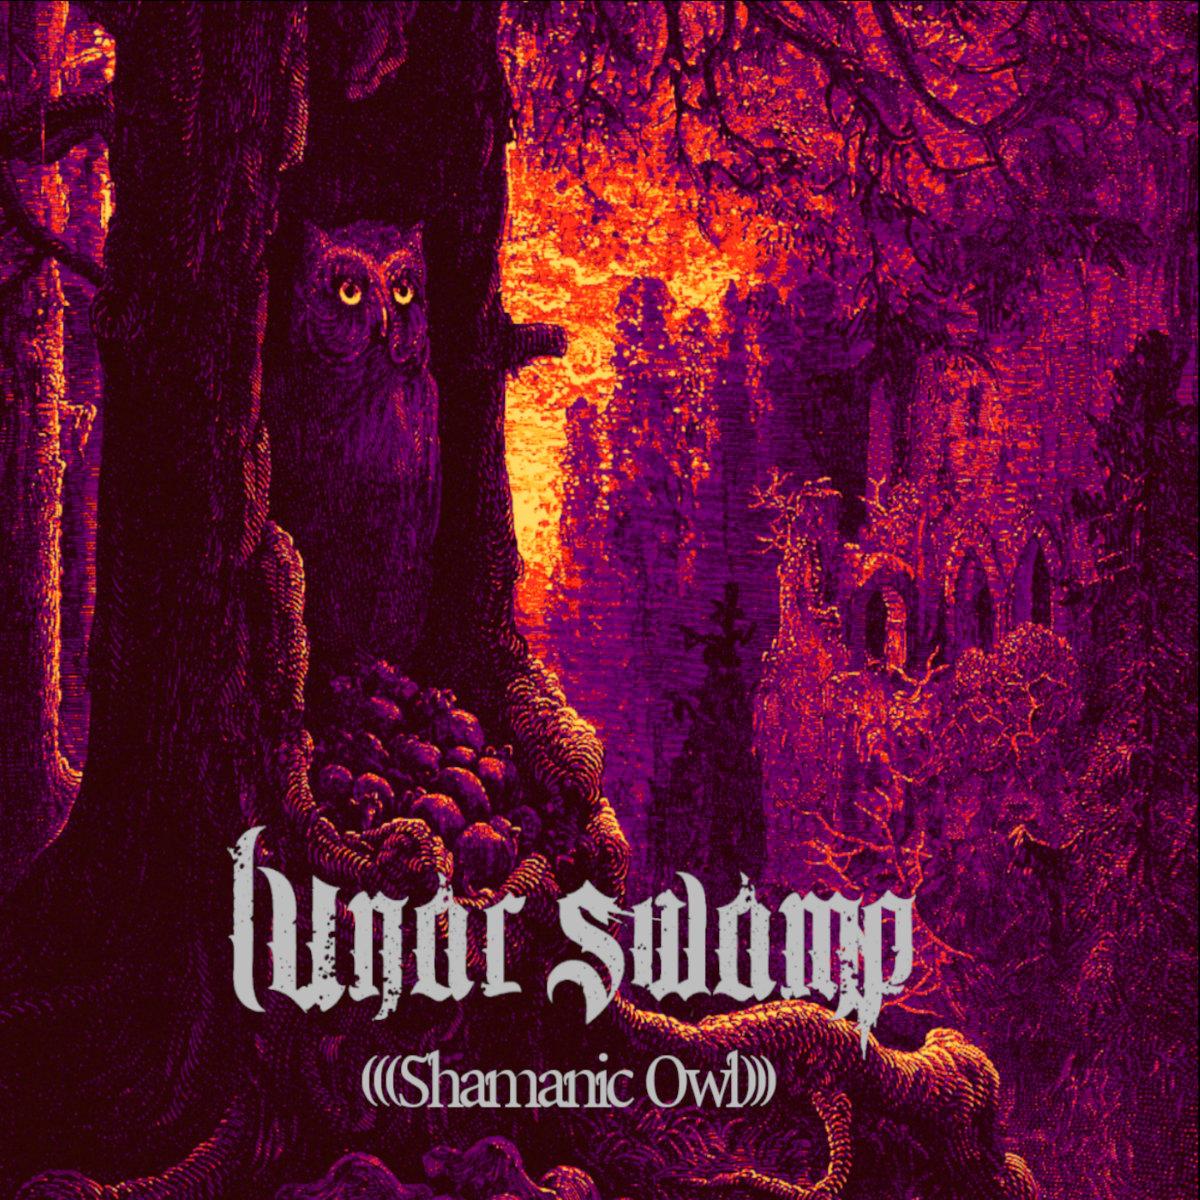 Lunar Swamp Shamanic Owl